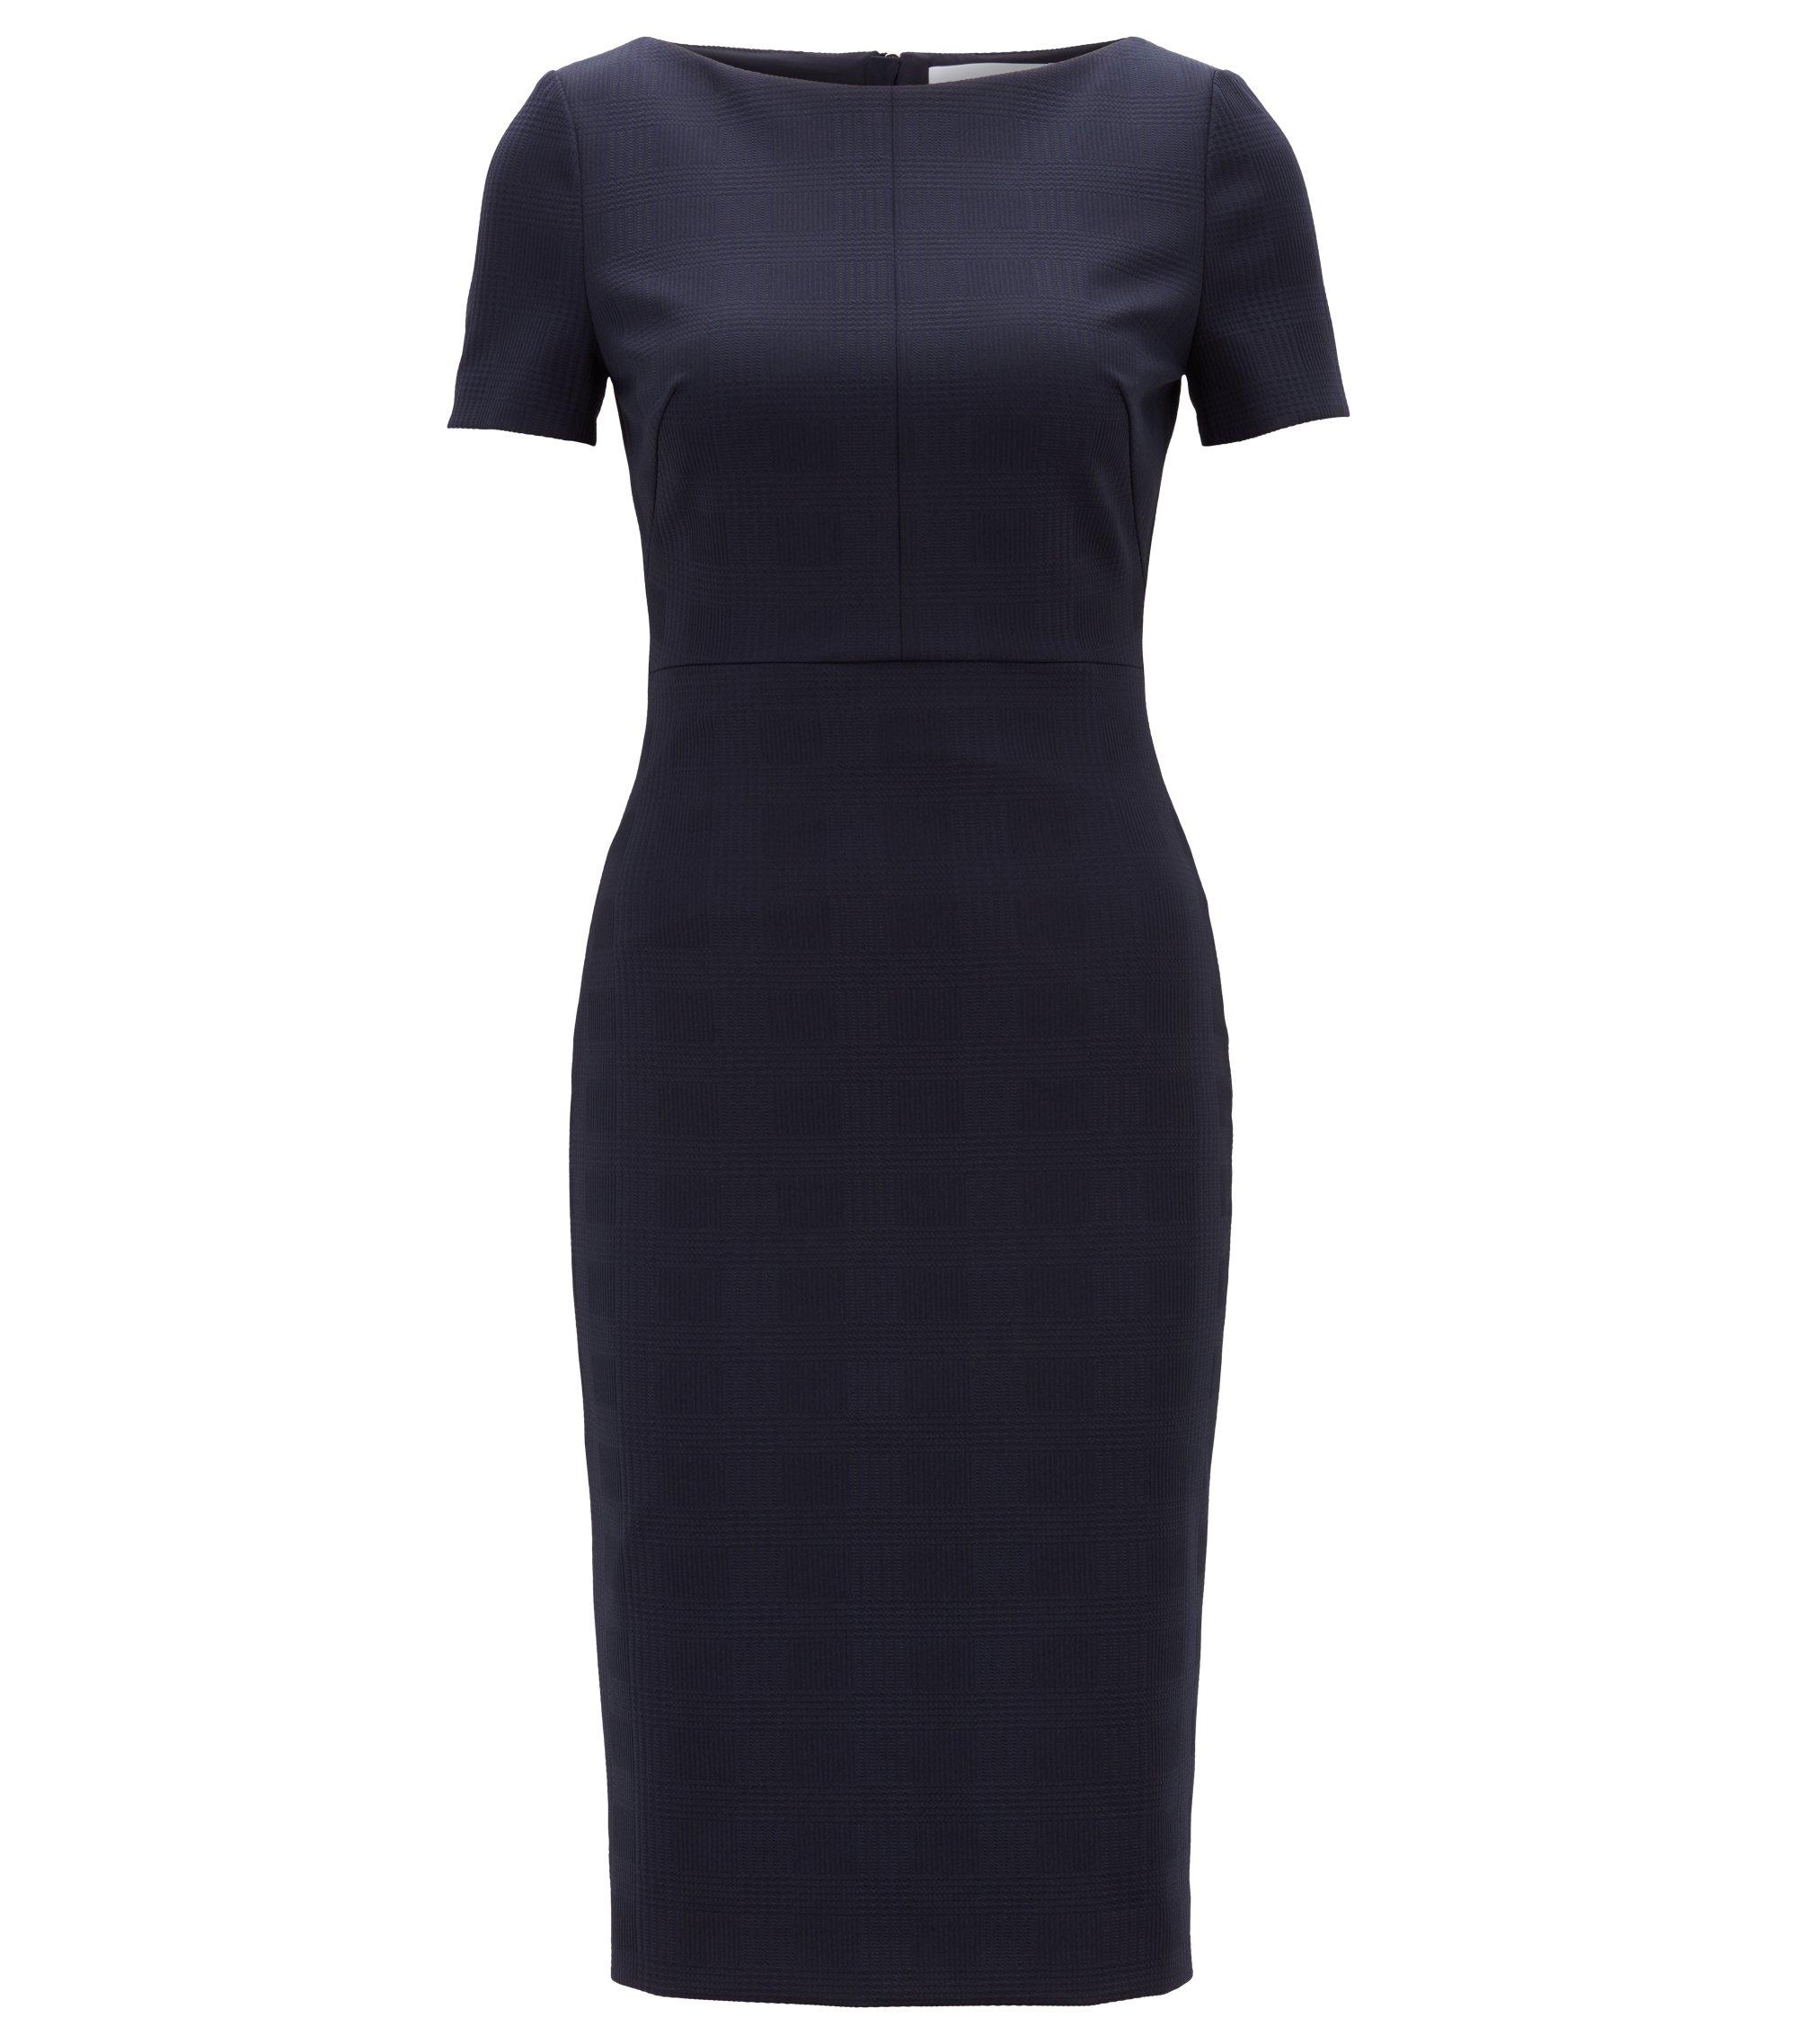 Vestido recto midi en punto elástico con textura, Azul oscuro